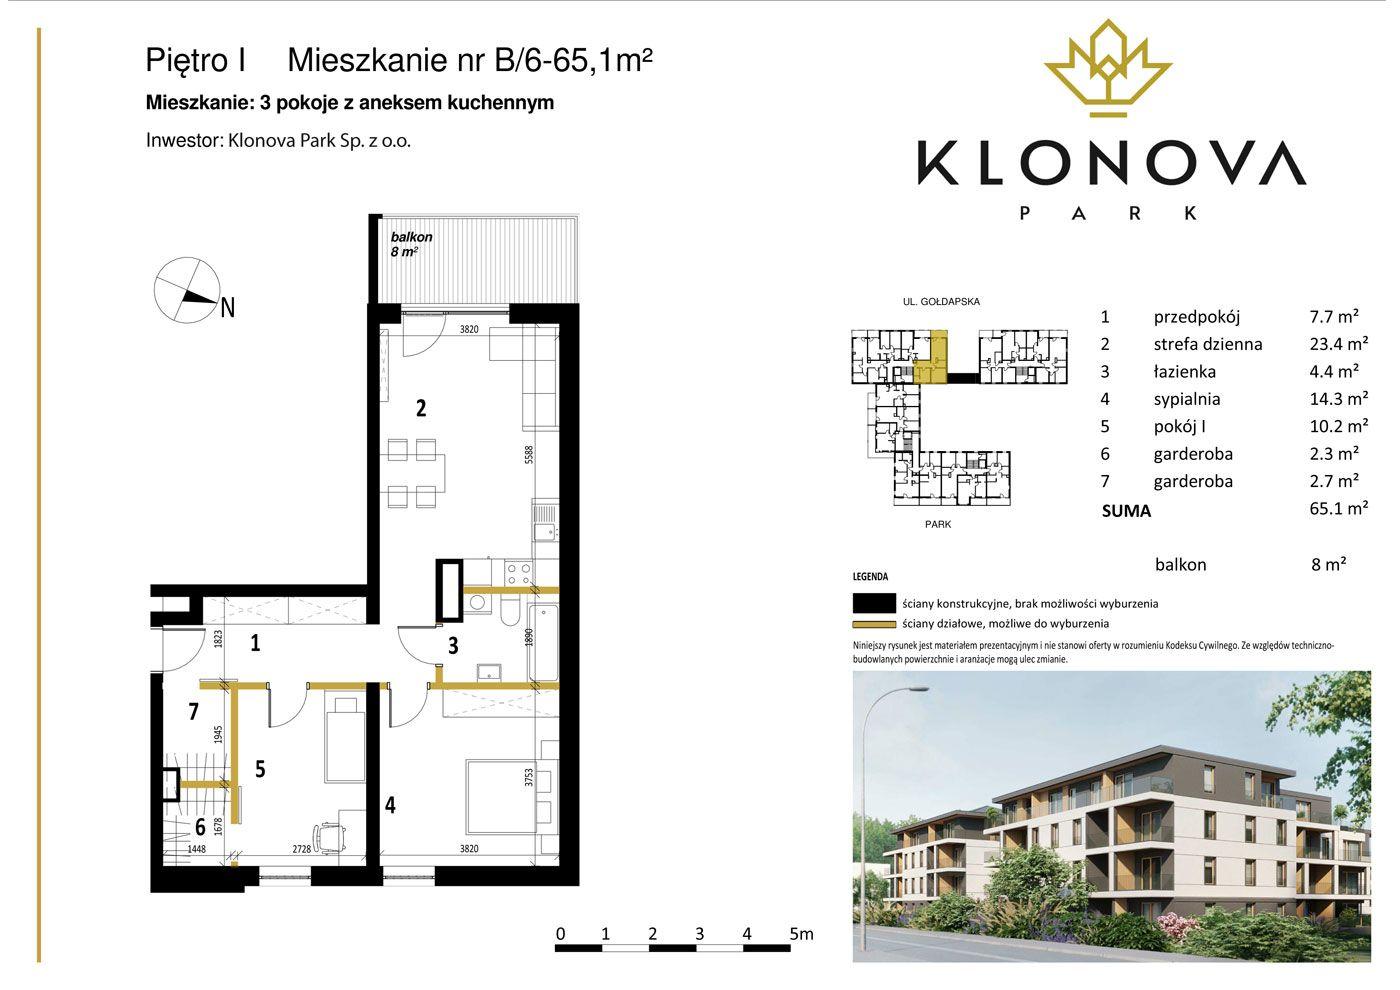 Apartamenty Klonova Park - Plan mieszkania B/6